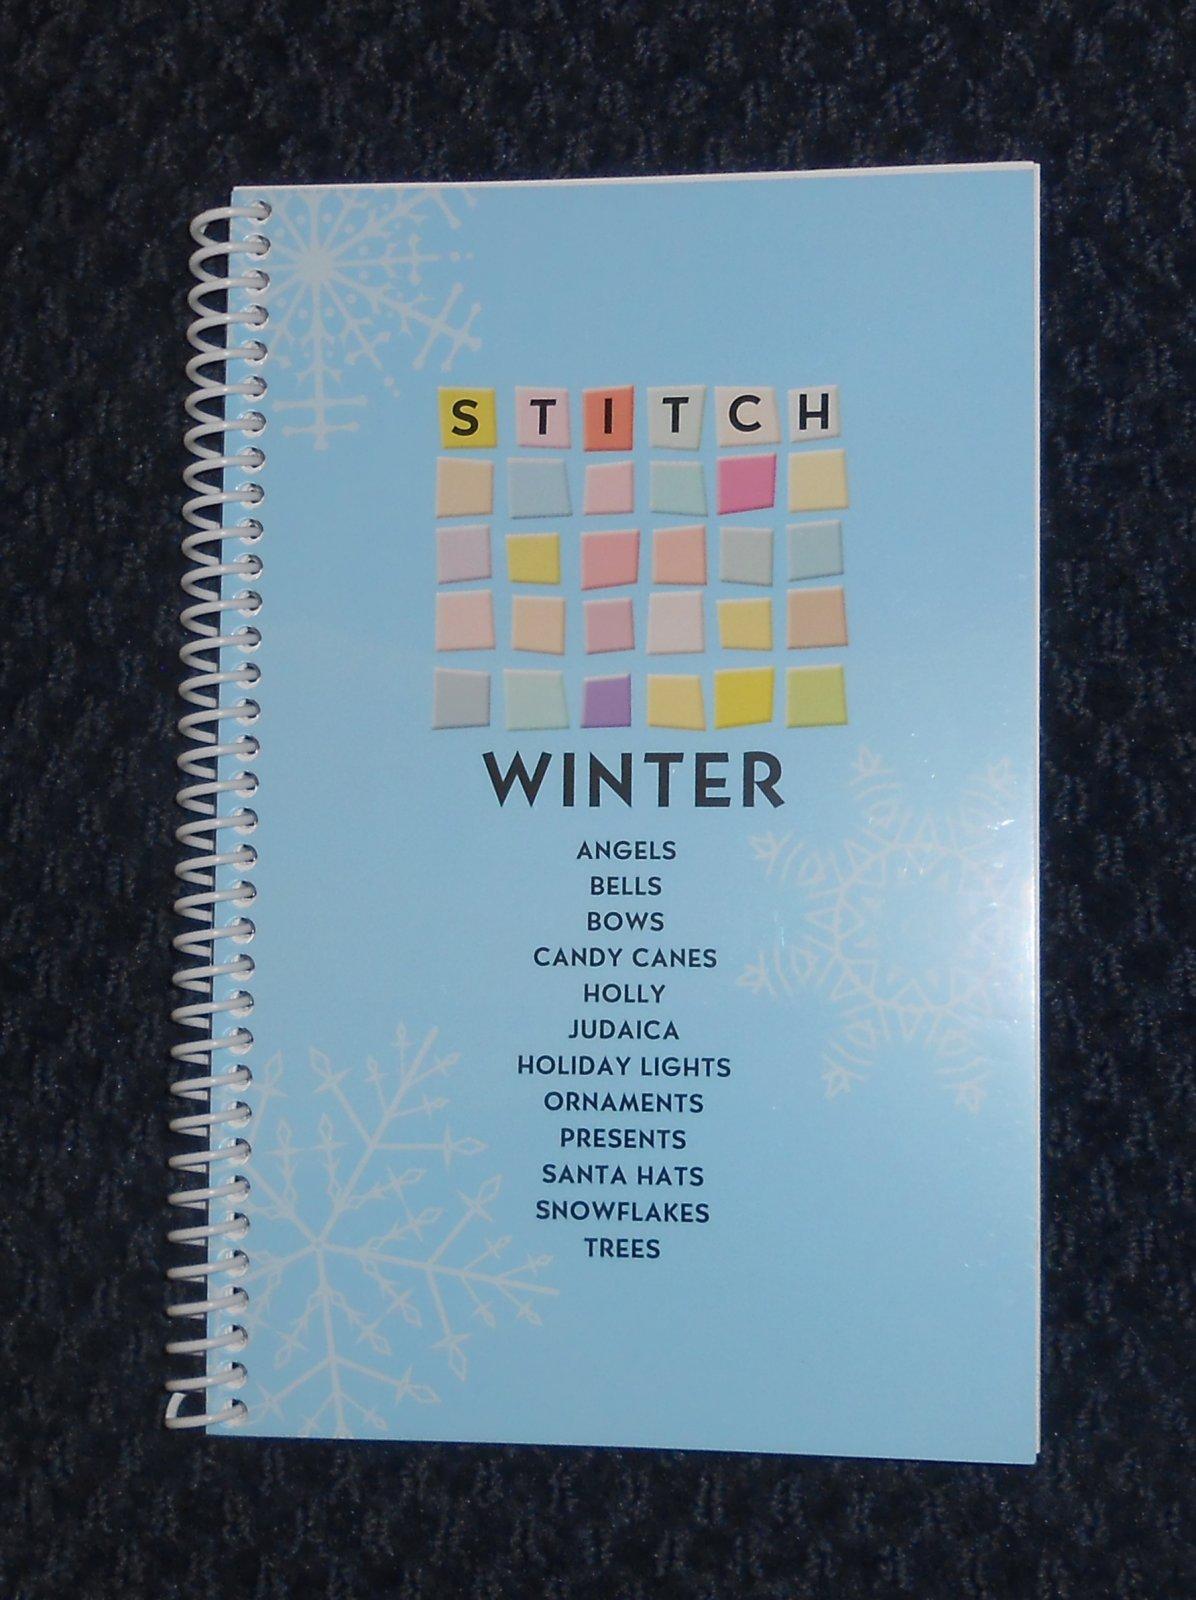 Winter - Stitches